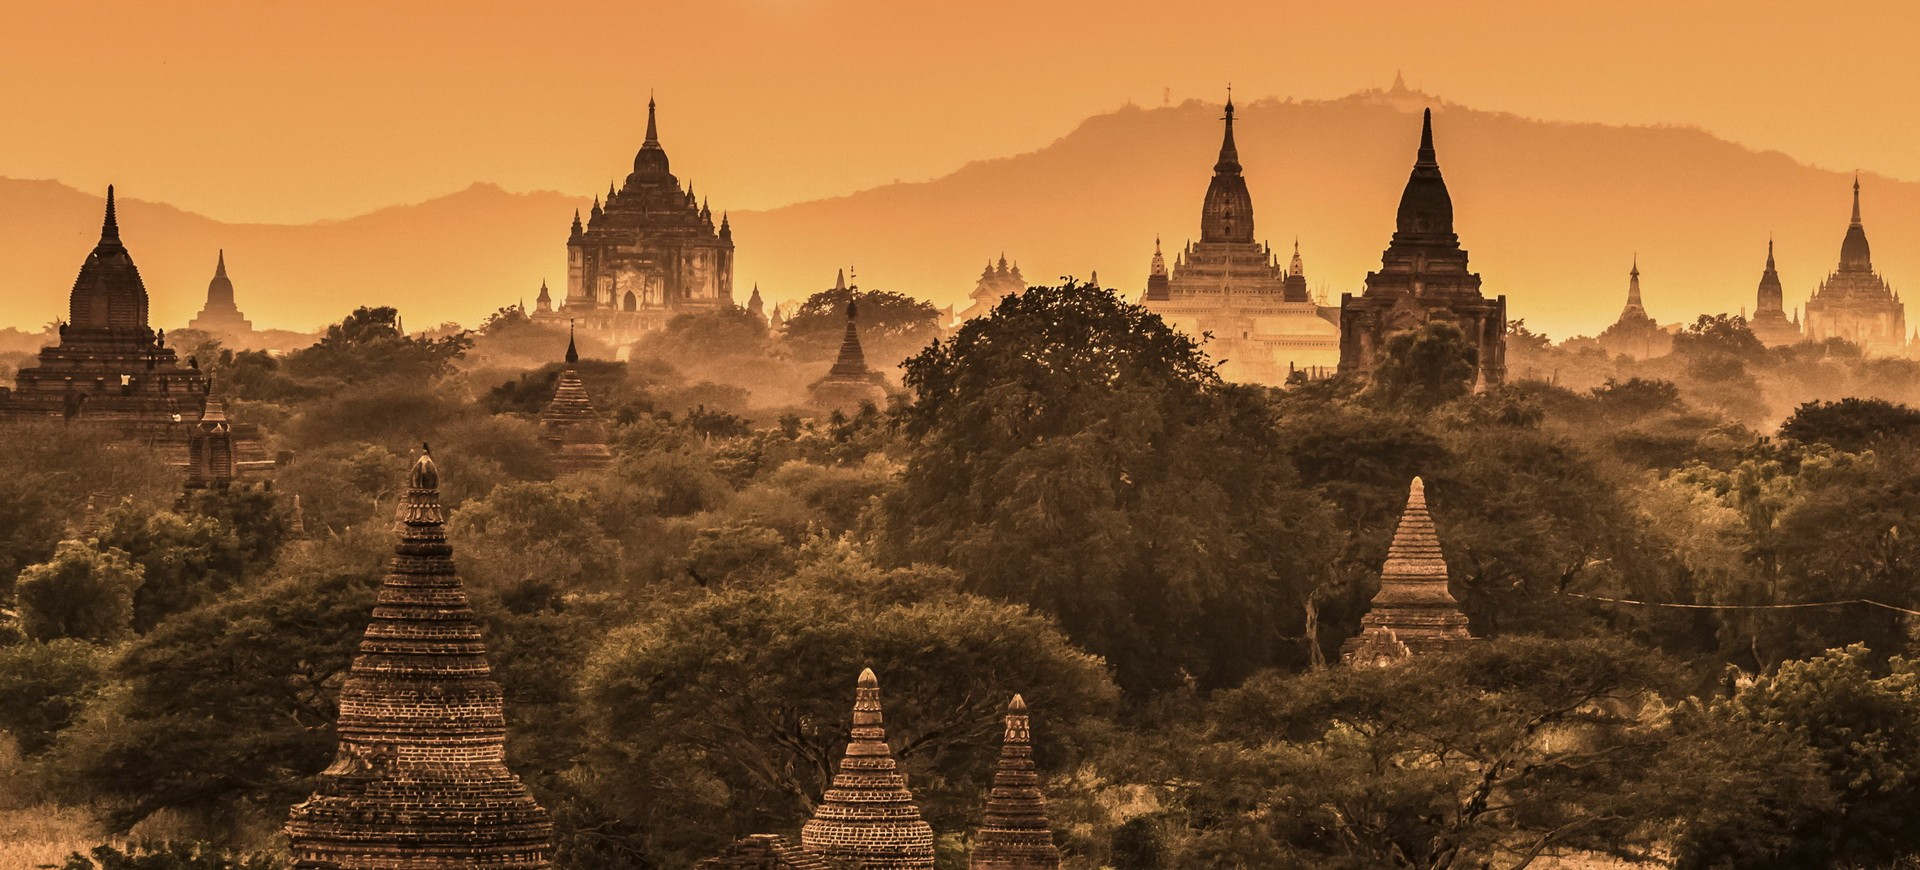 Birmanie Pagan Pagodes Bouddhistes